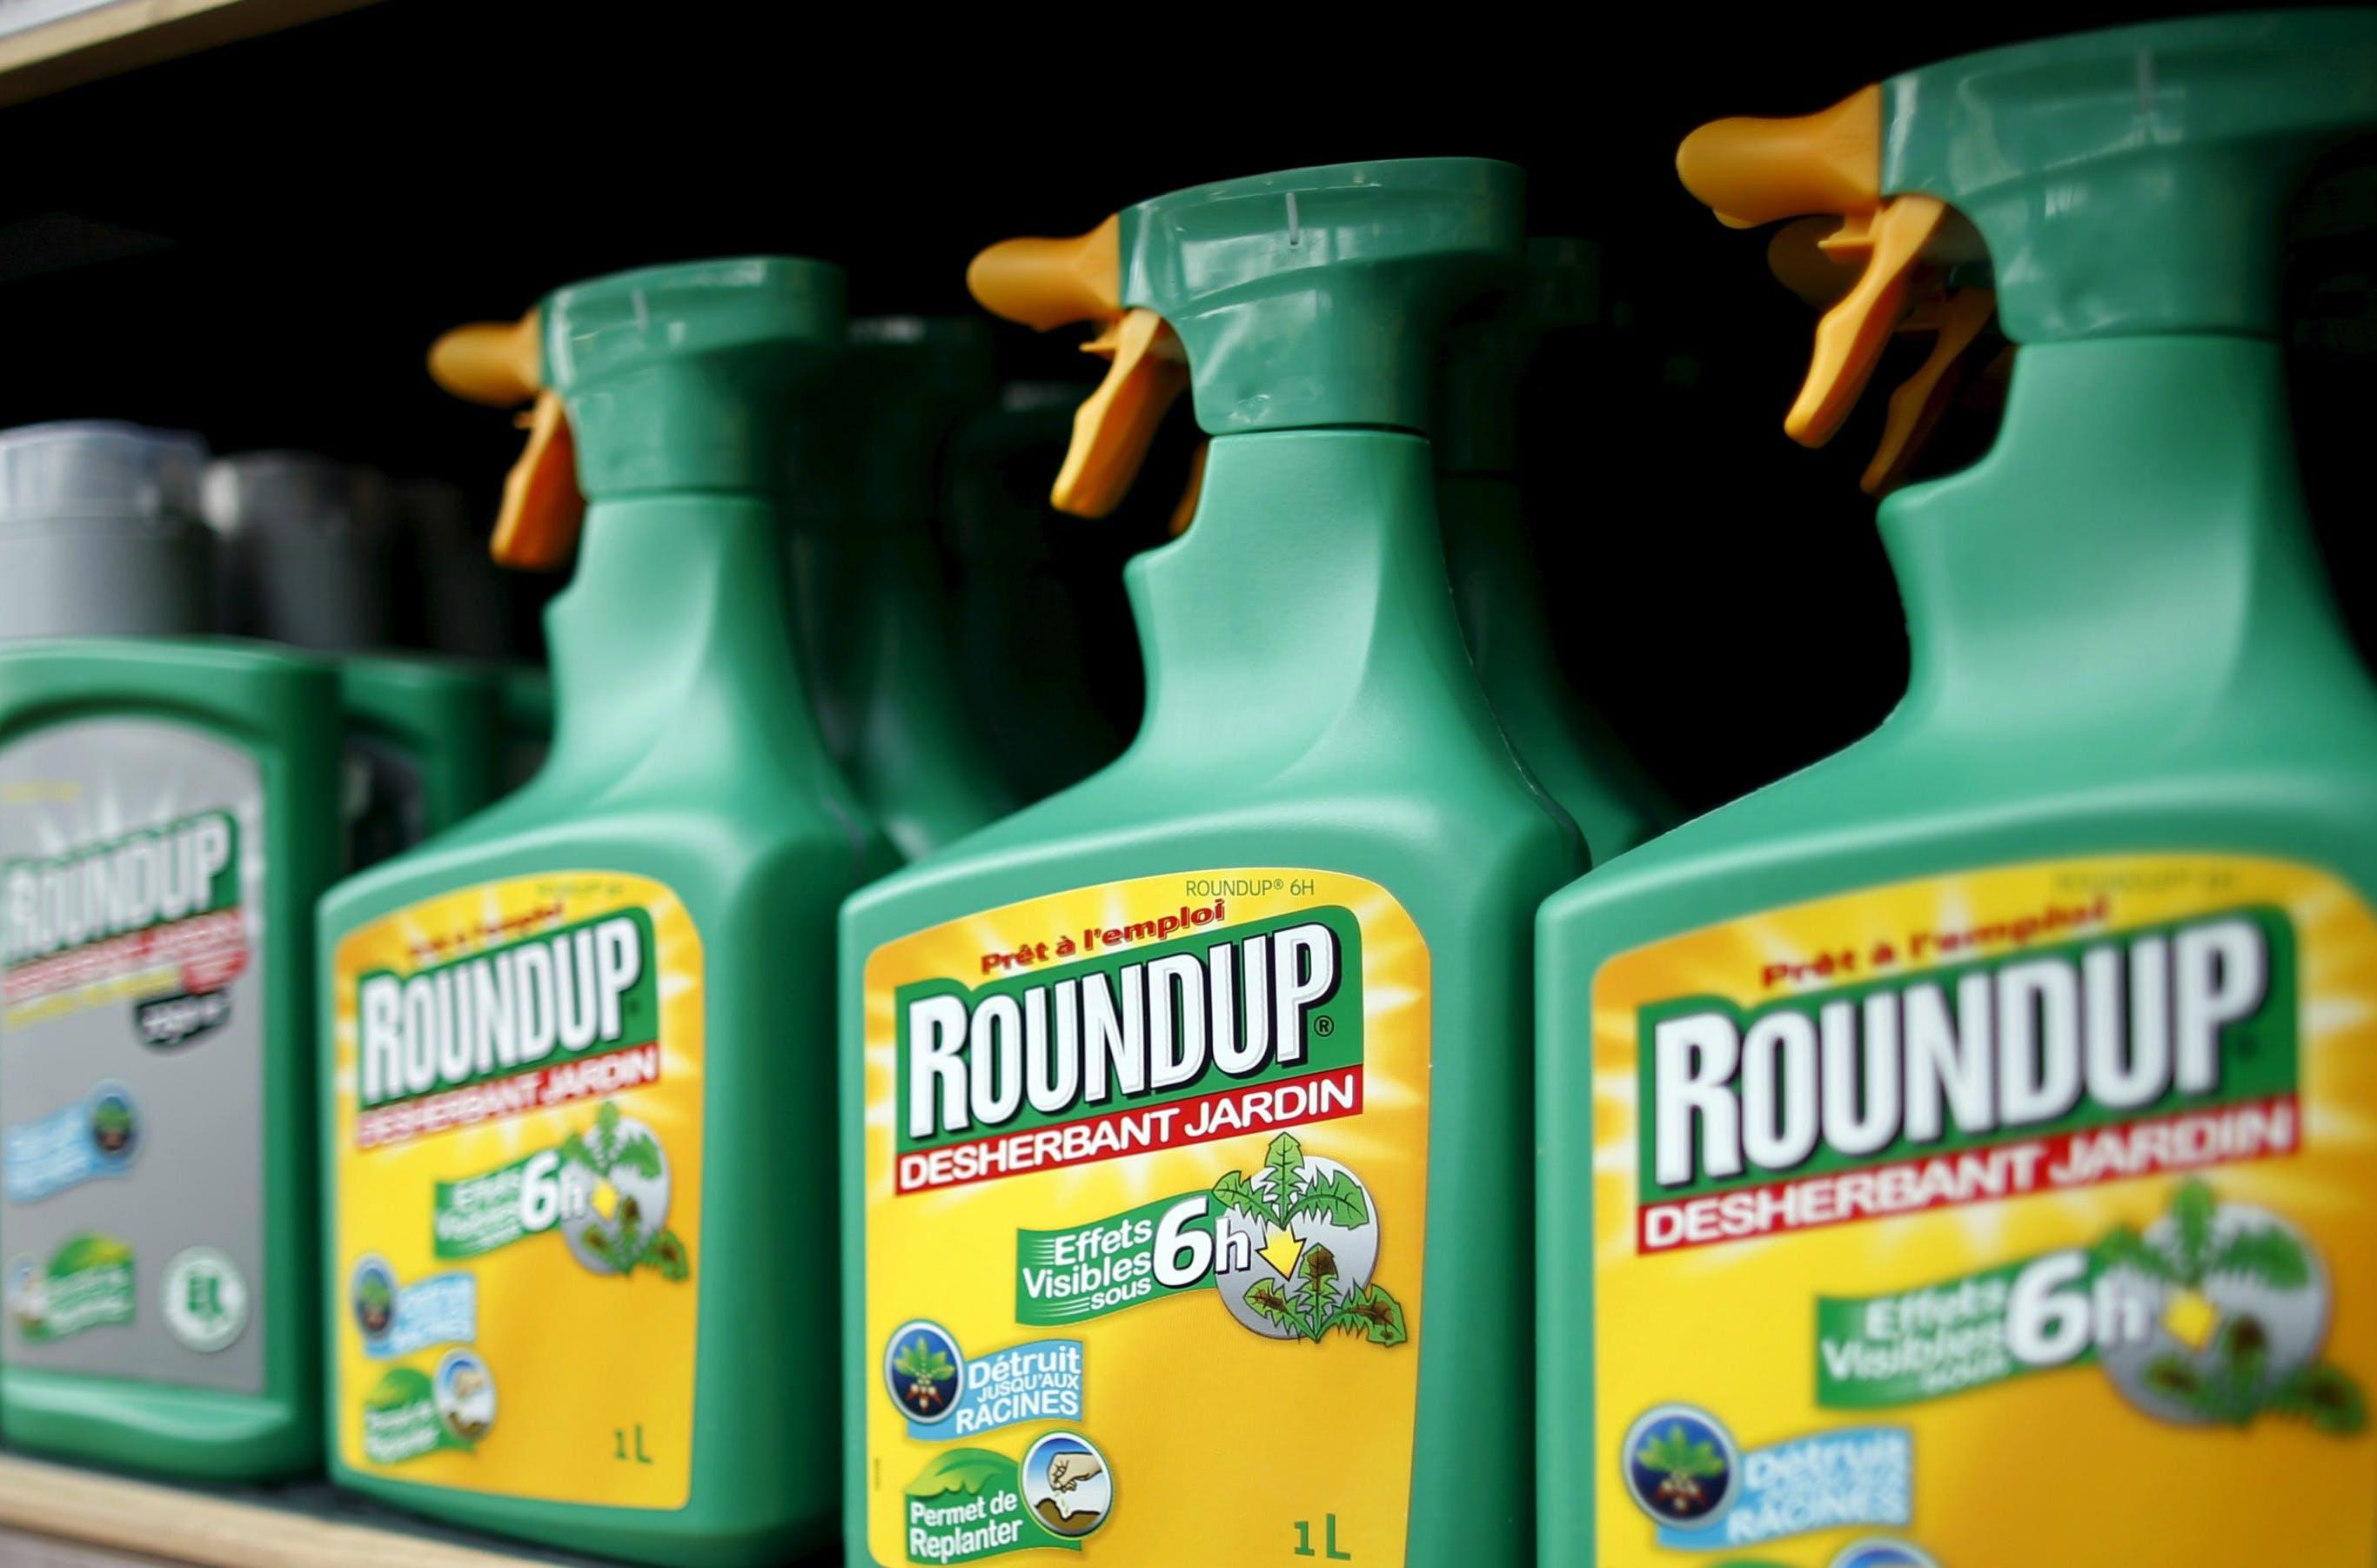 Roundup, con glifosato, peligroso para la salud